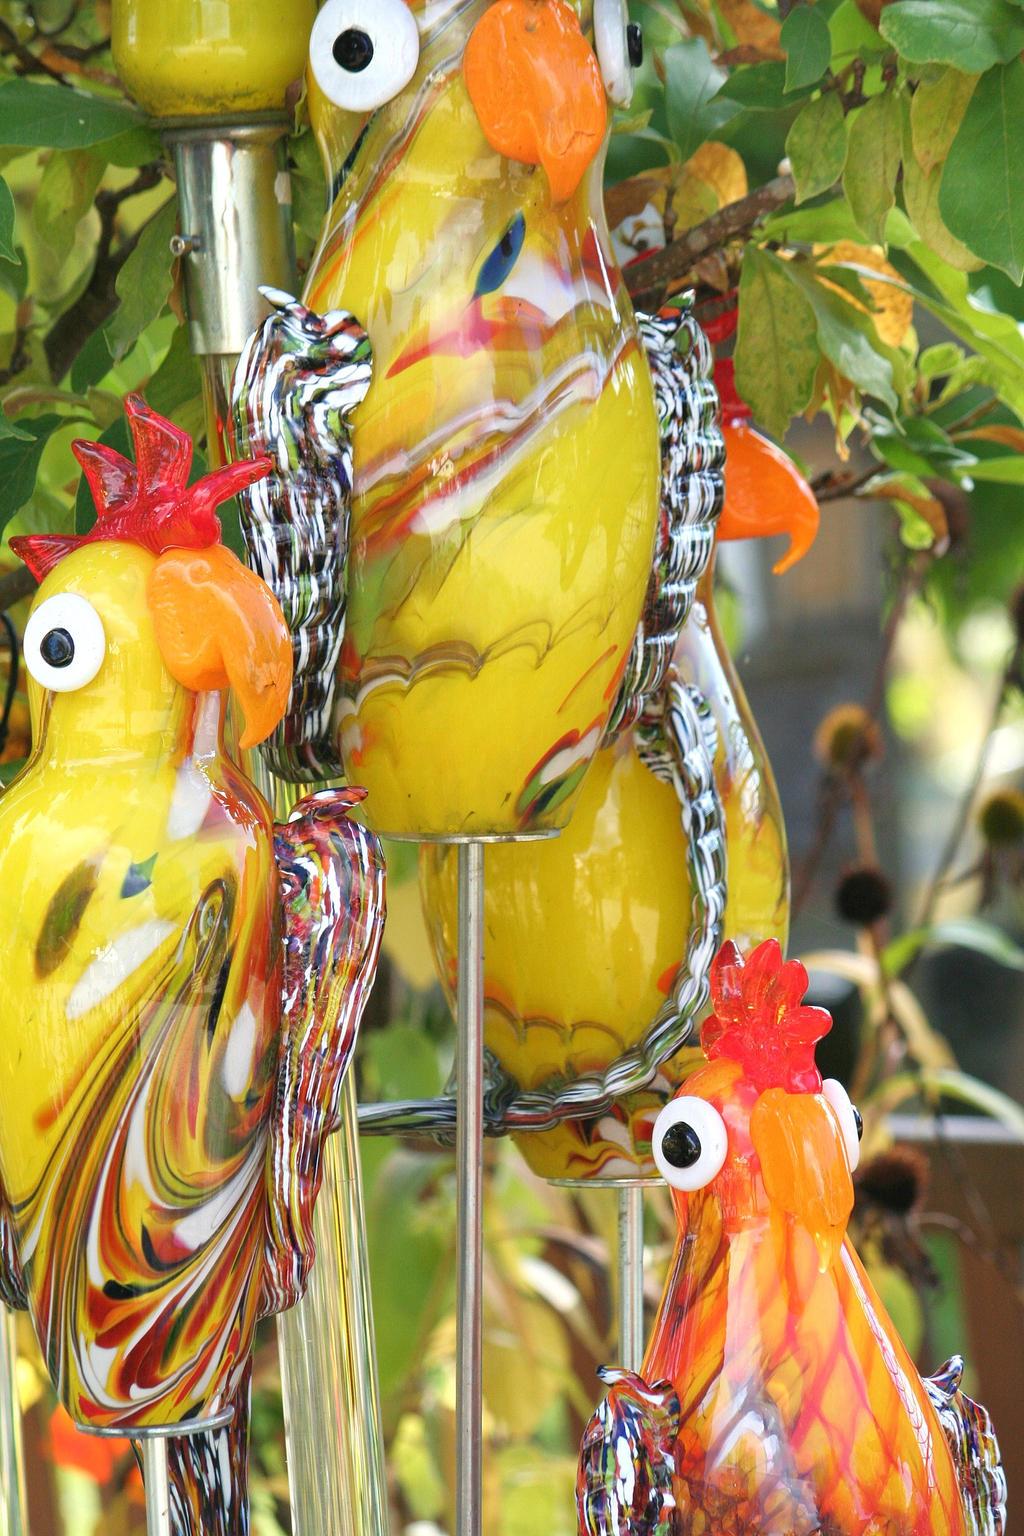 chicken glass art by ingeline-art